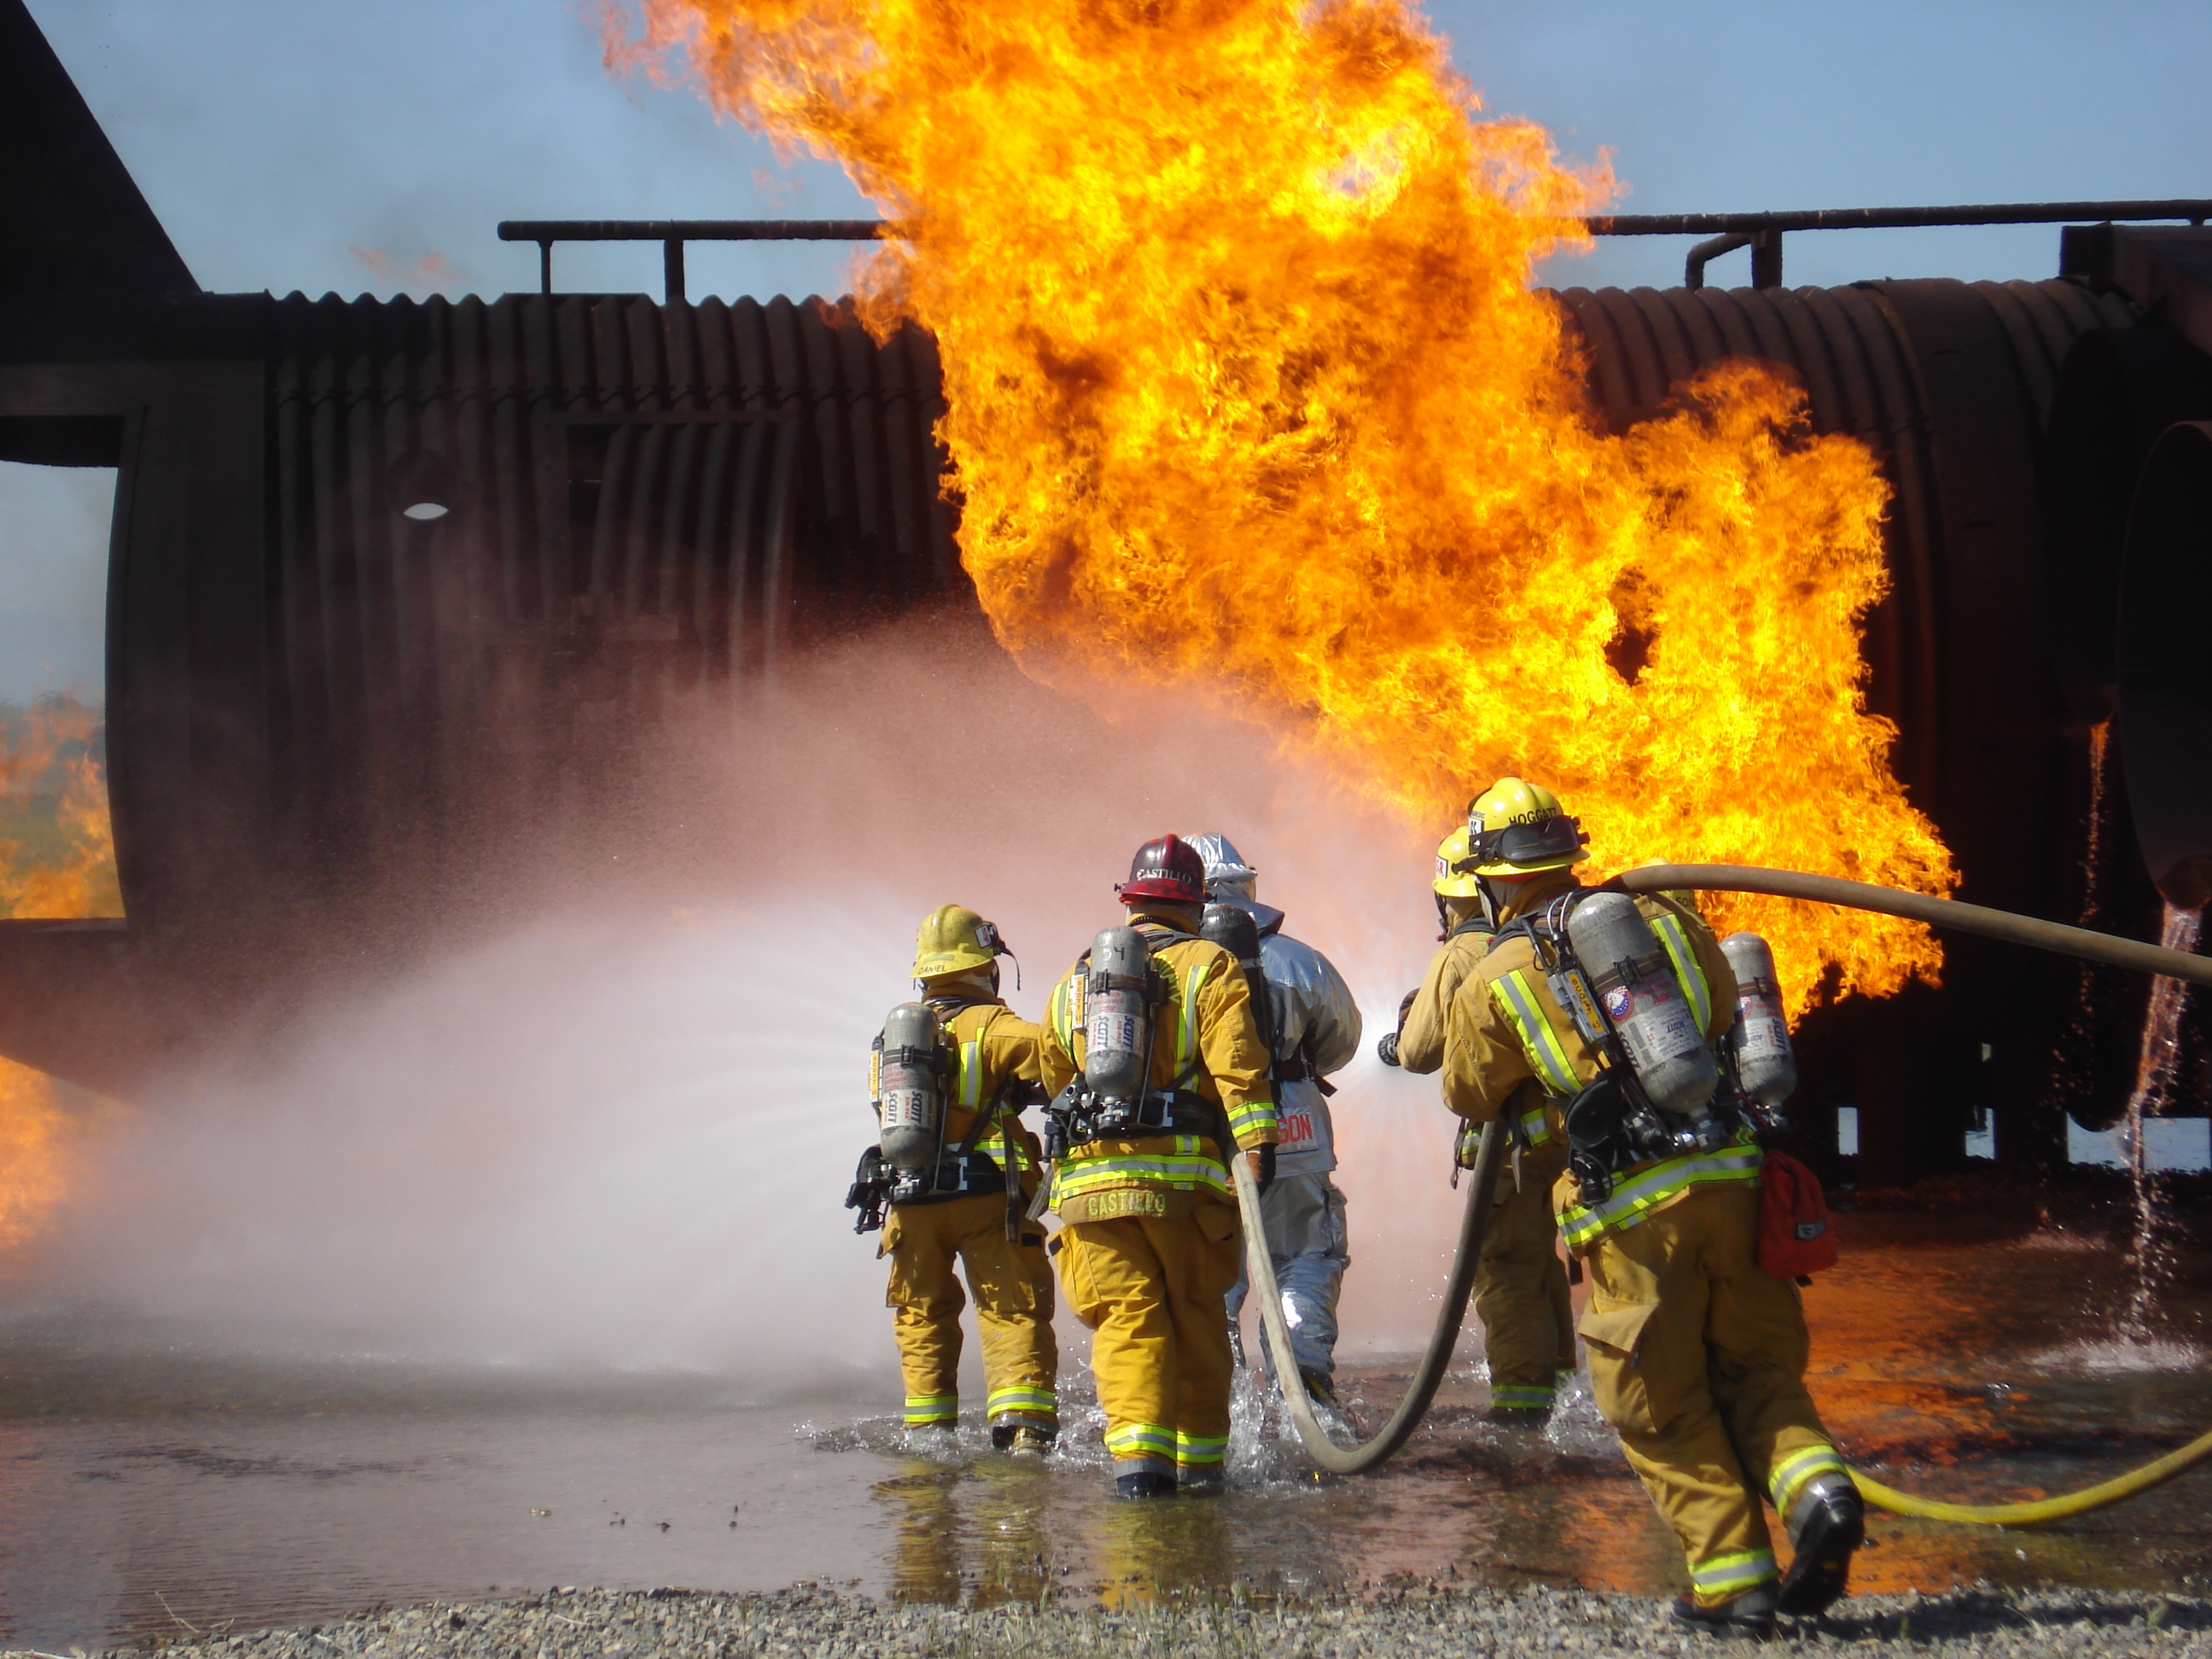 Hd Wallpapers Firefighter Fighting Fire 1024 X 683 226 Kb Jpeg HD 2592x1944